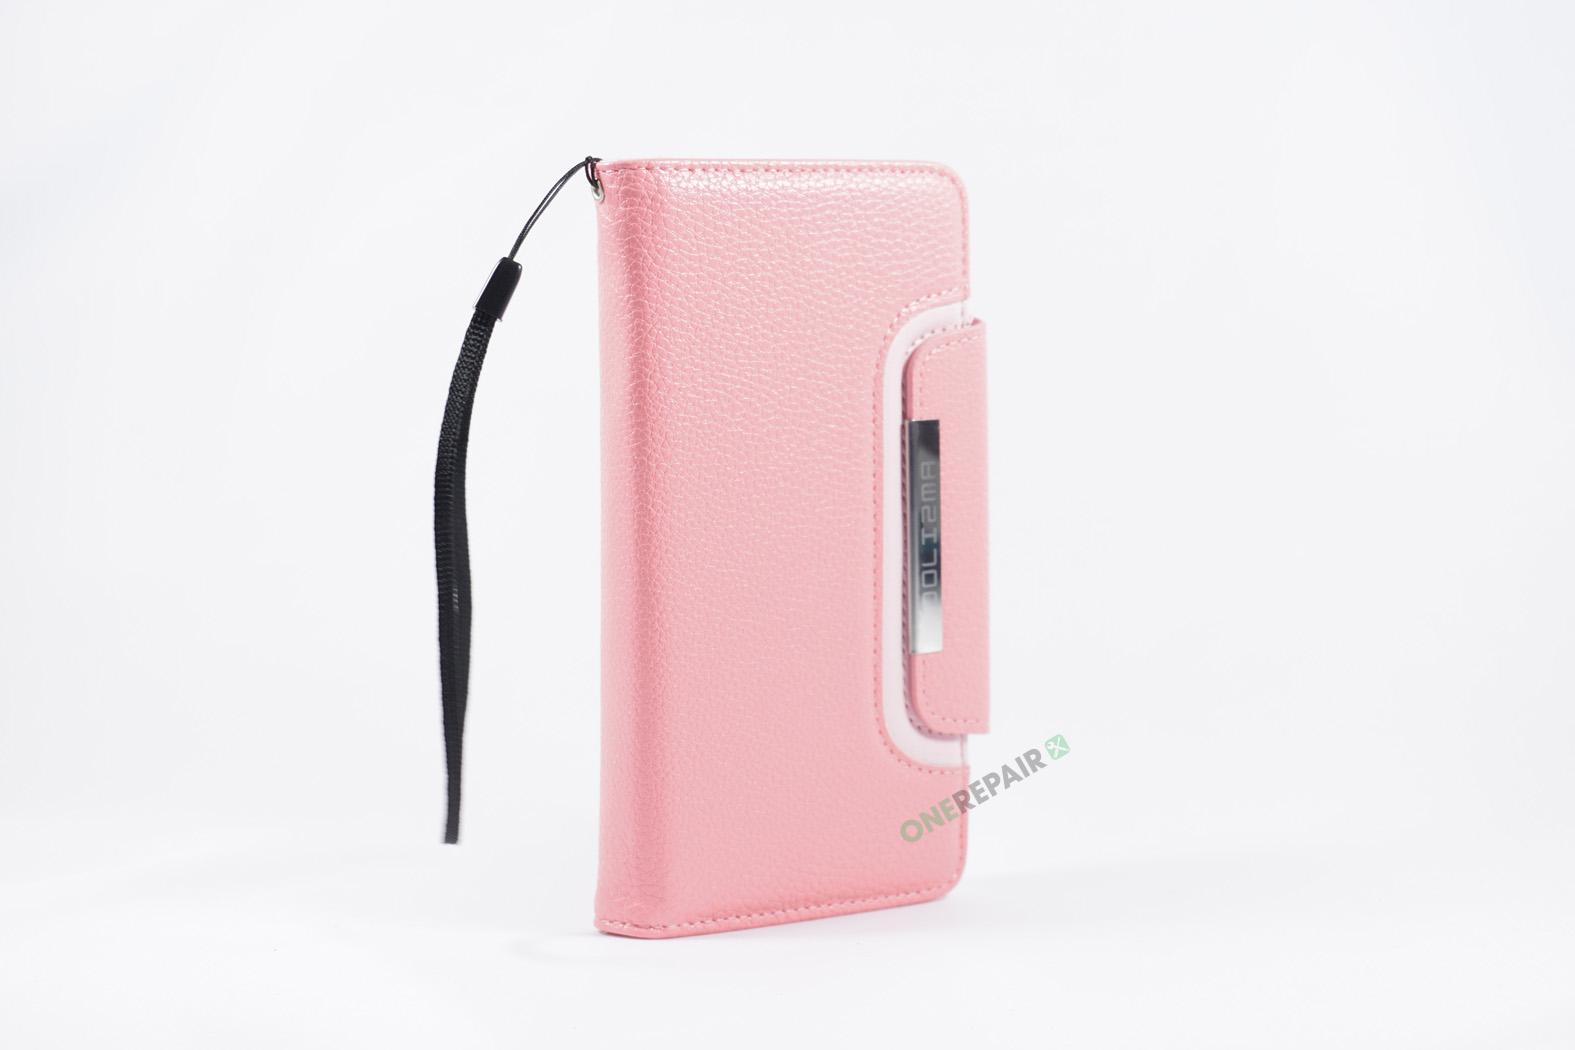 350852_iPhone_7+_8+_Plus_Flipcover_Magnet_Cover_Lyseroed_Pink_OneRepair_WM_00006